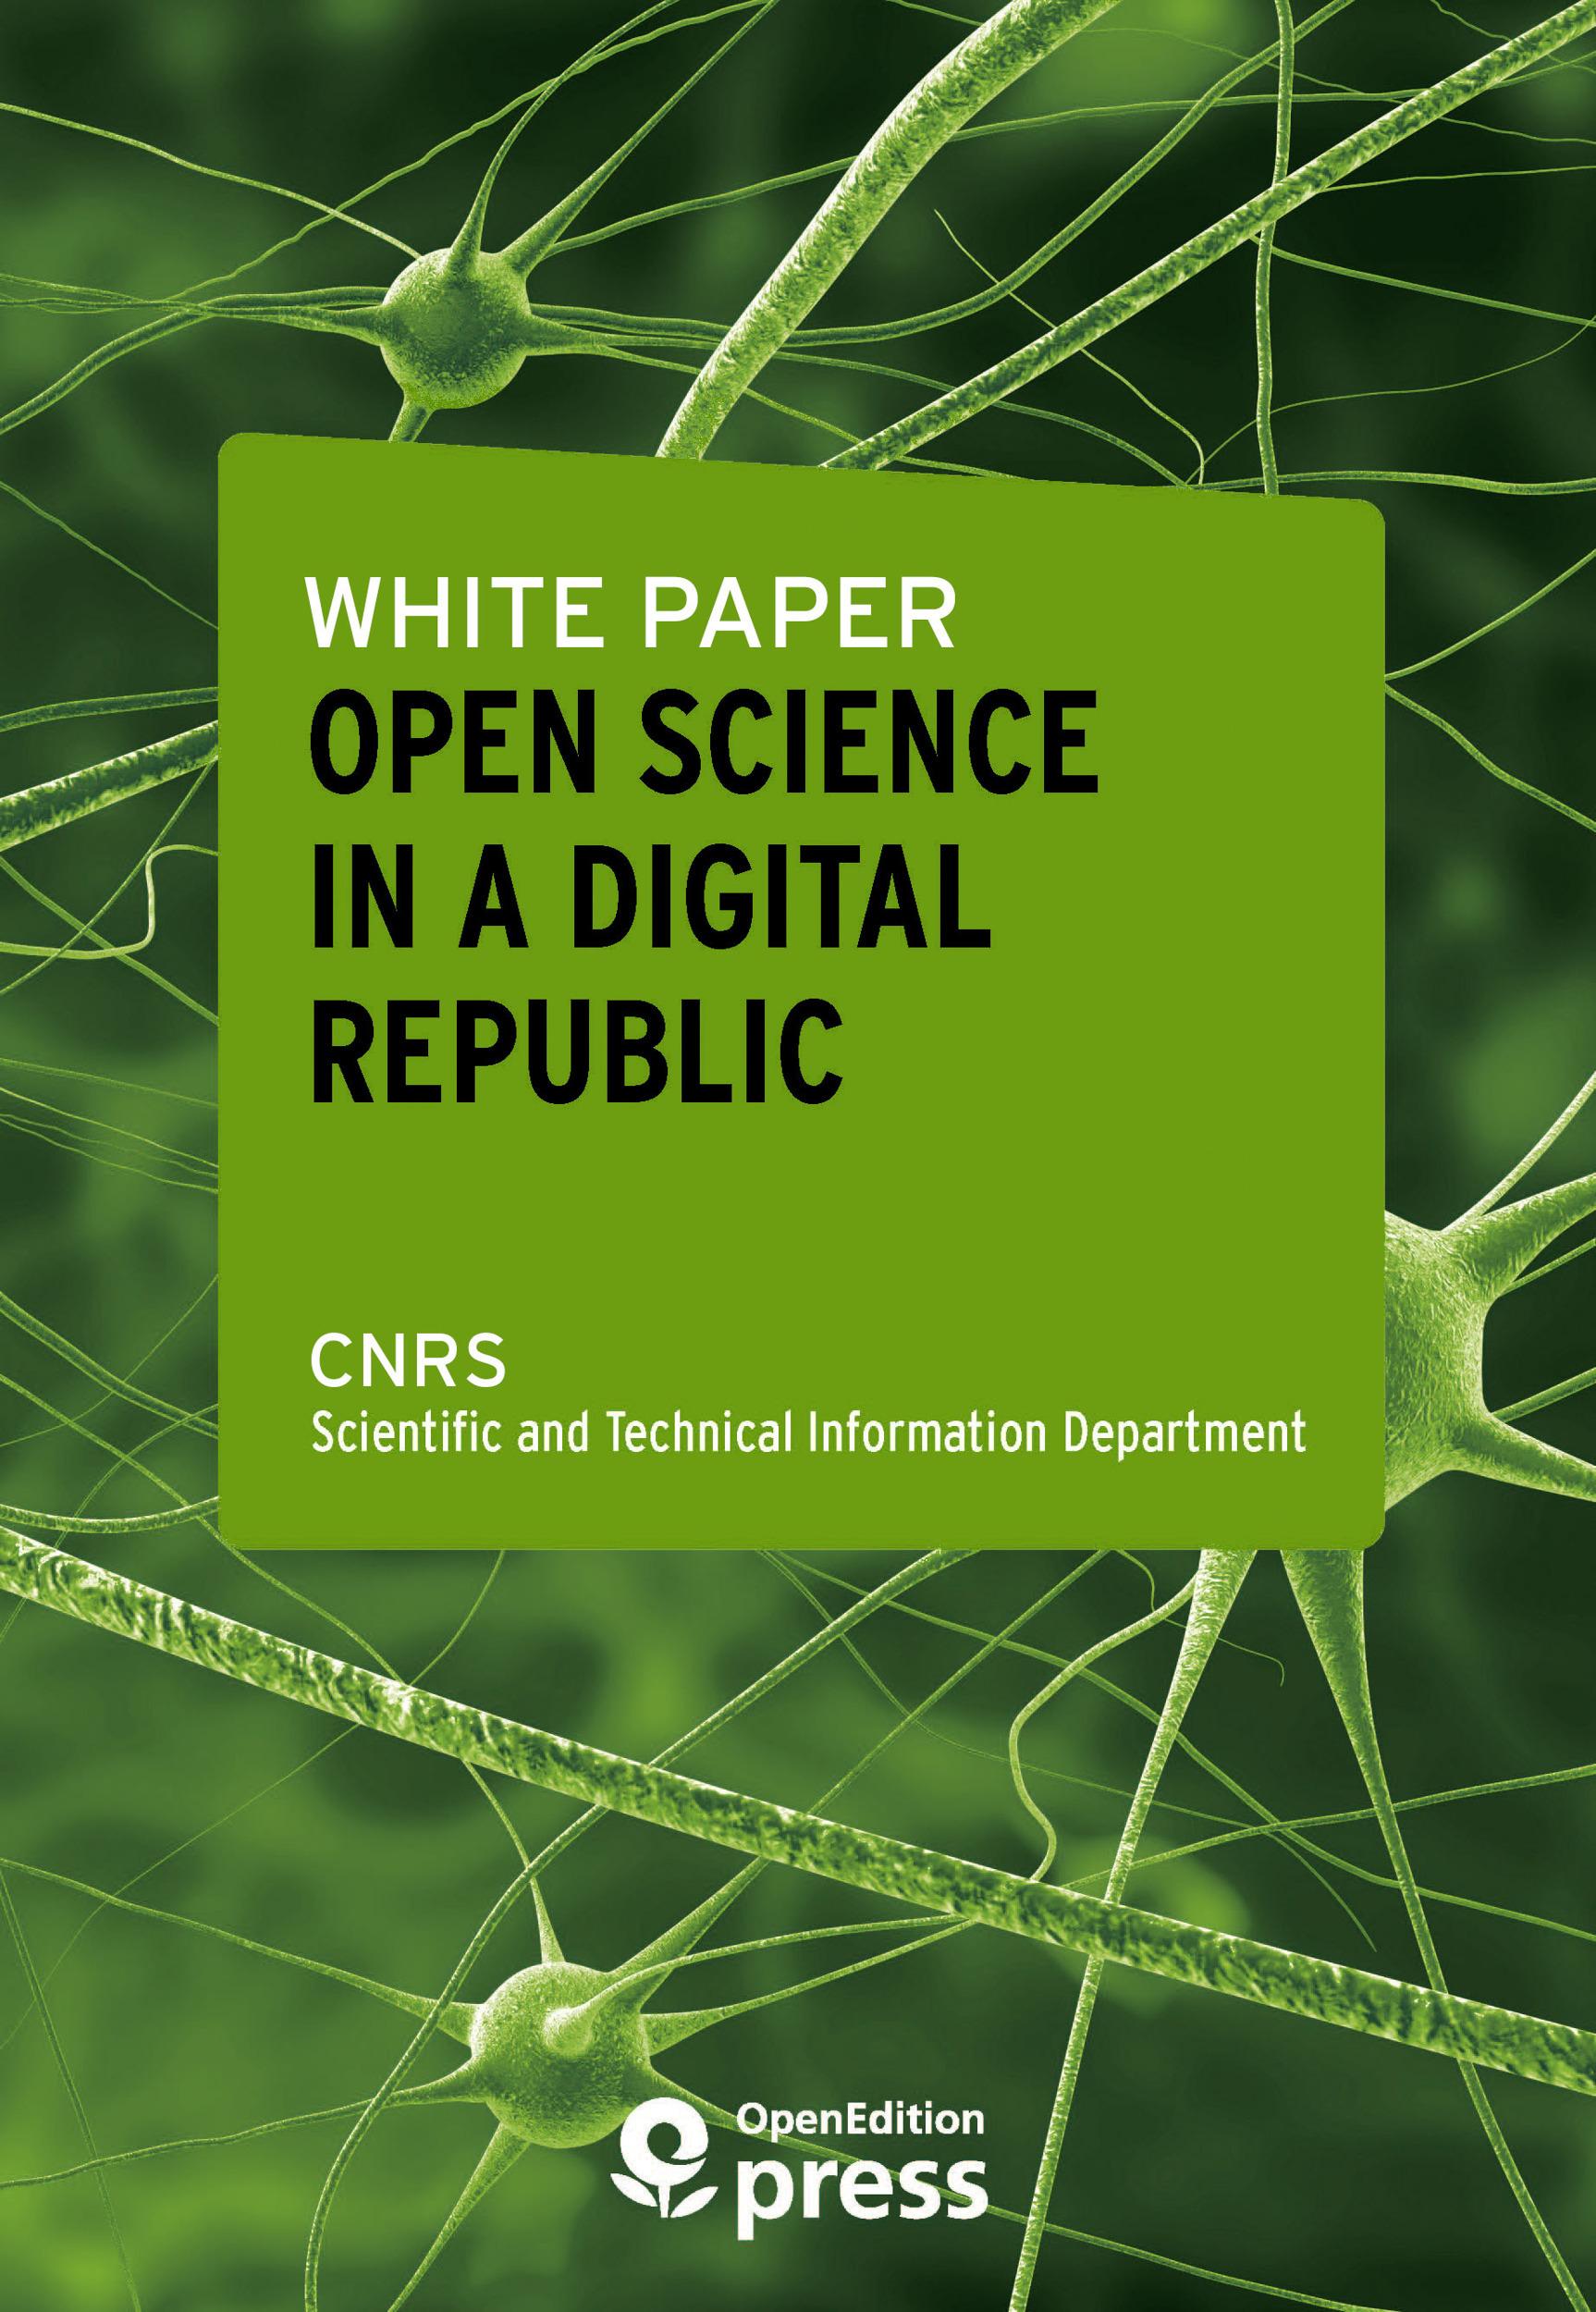 White Paper - Open Science in a Digital Republic